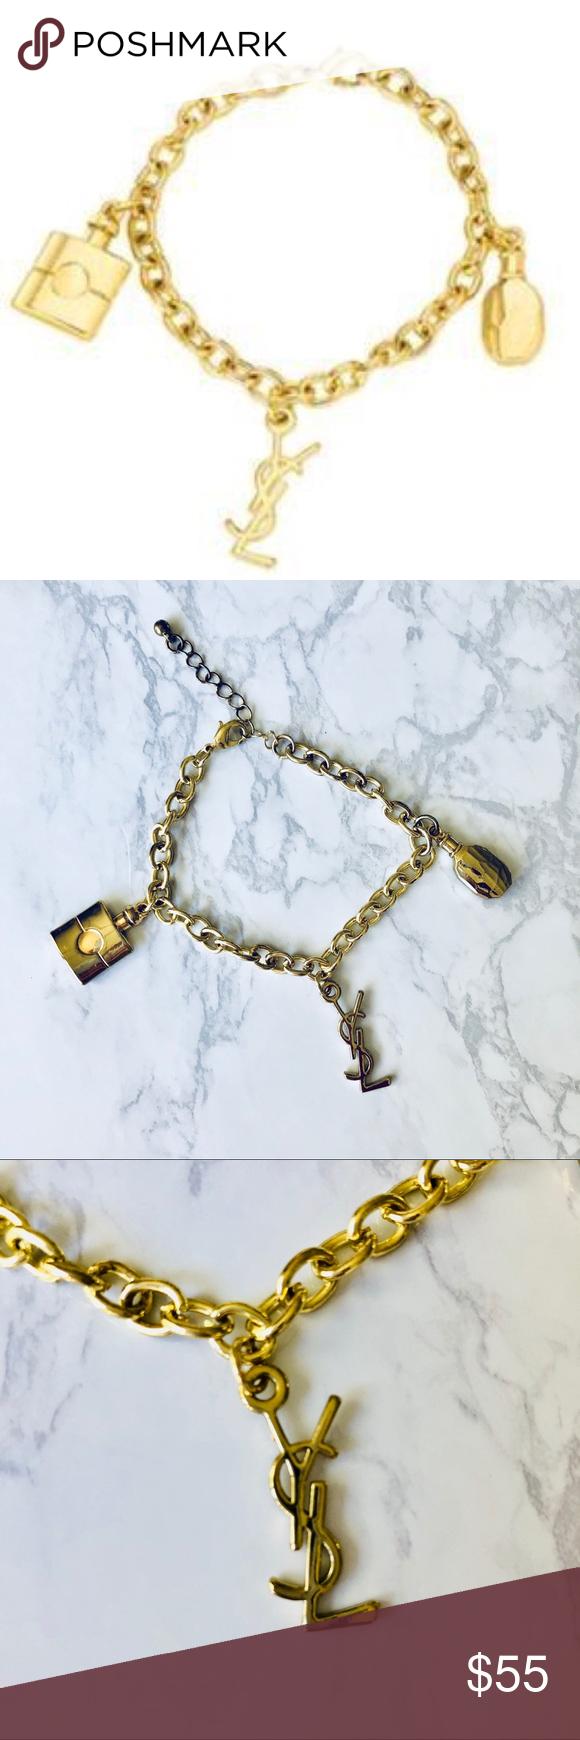 YSL Limited Edition Gold Charm Bracelet My Posh Picks Pinterest